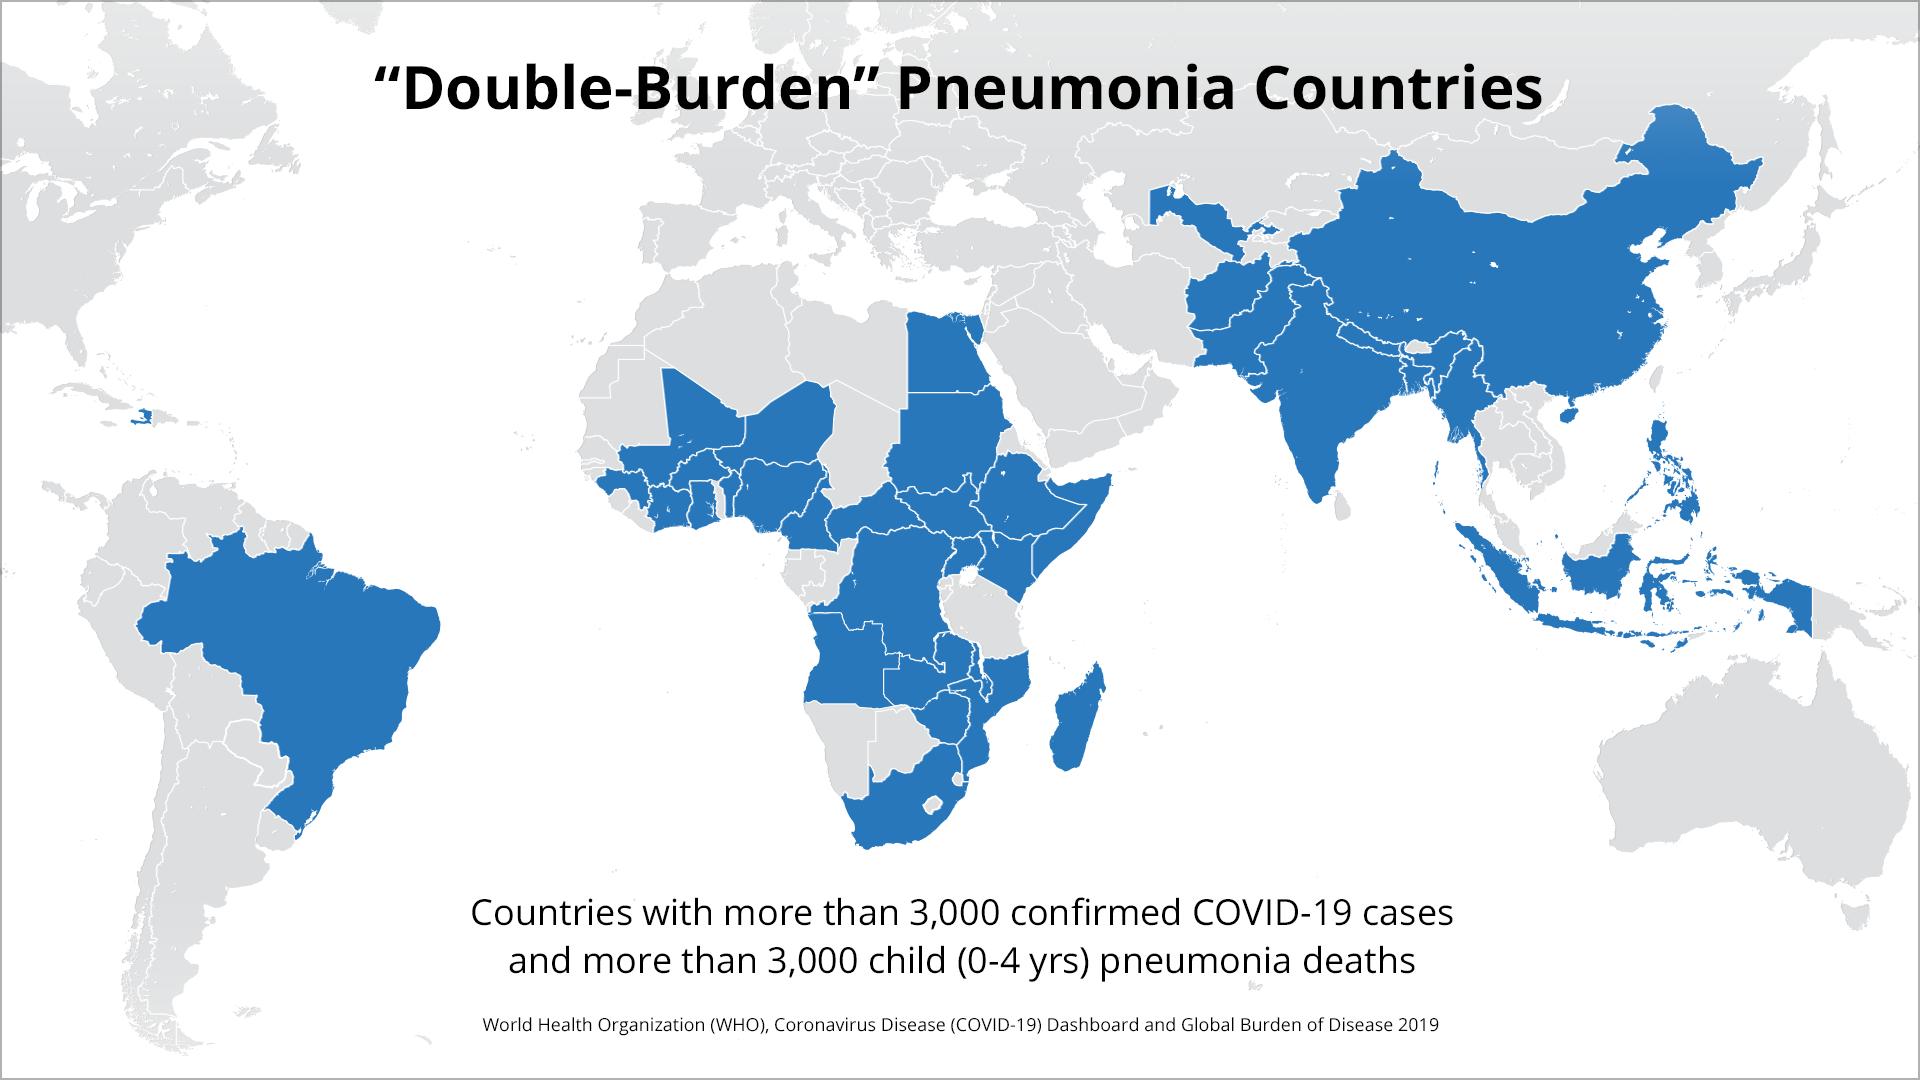 Double-Burden Pneumonia Countiries